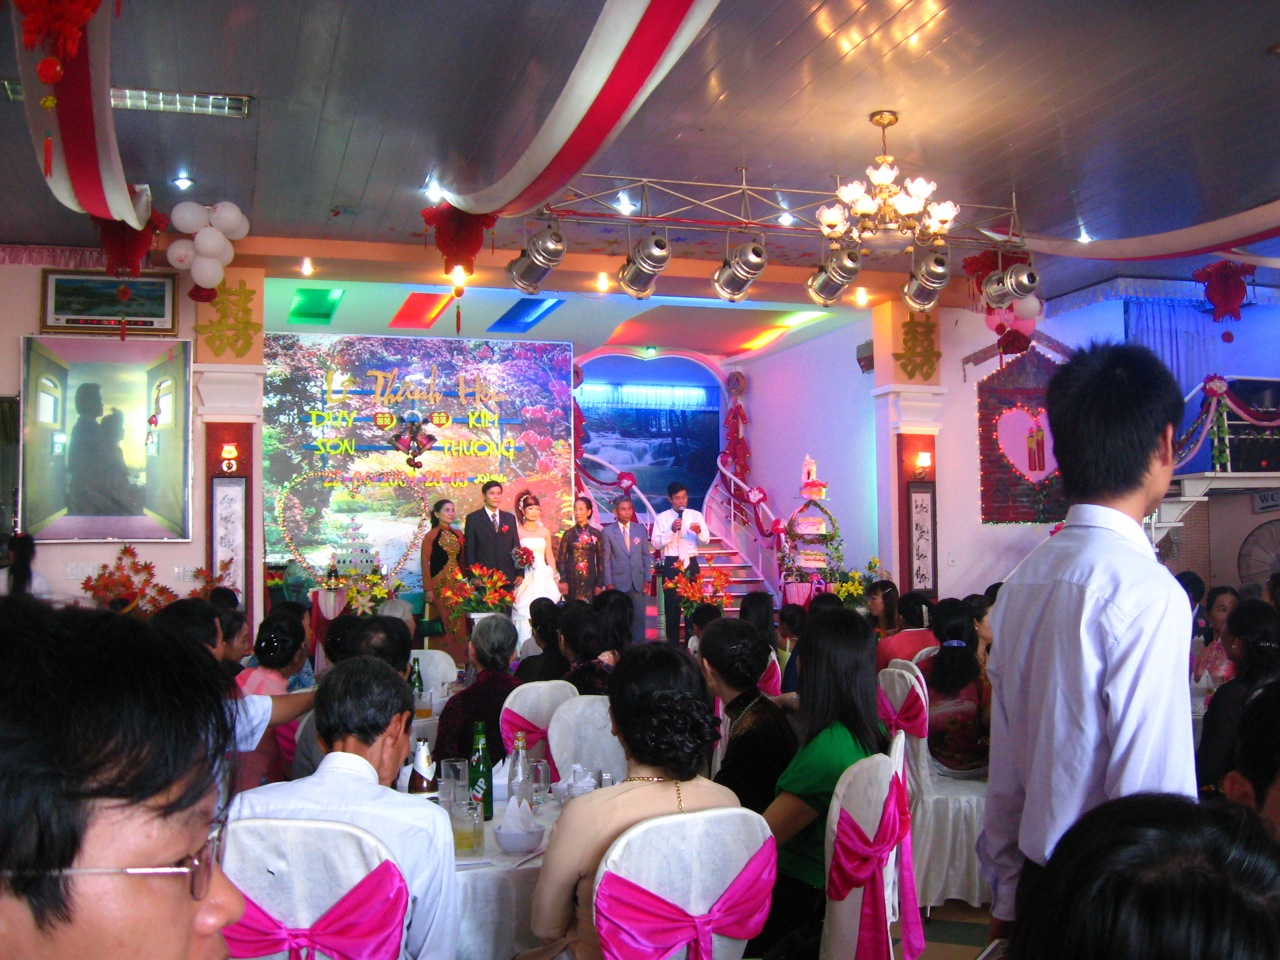 Filevietnamese wedding receptiong wikimedia commons filevietnamese wedding receptiong junglespirit Gallery